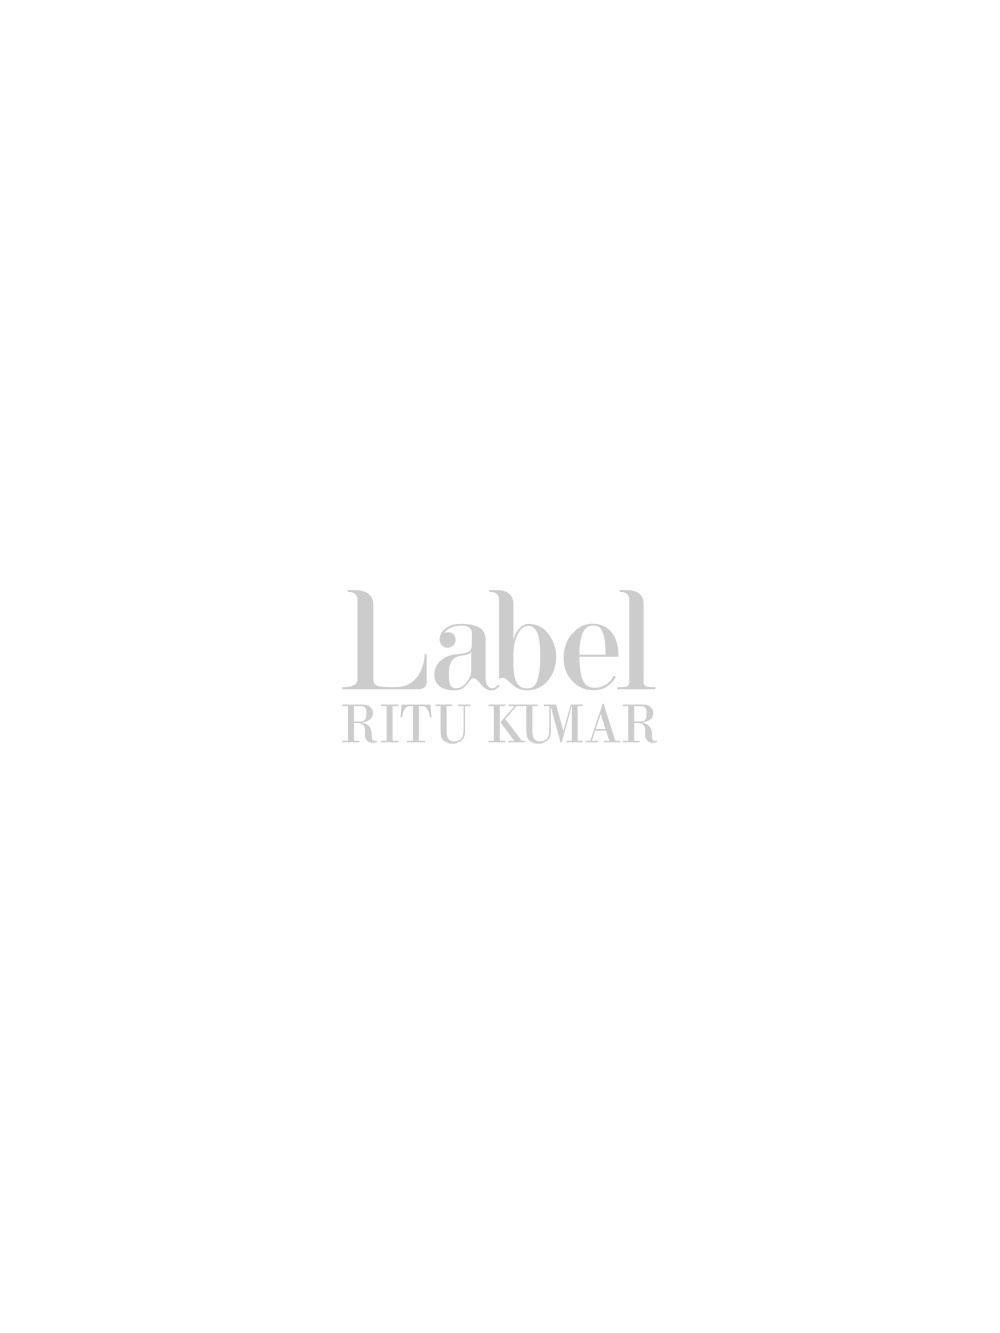 Blue Flared Short Top By Label Ritu Kumar